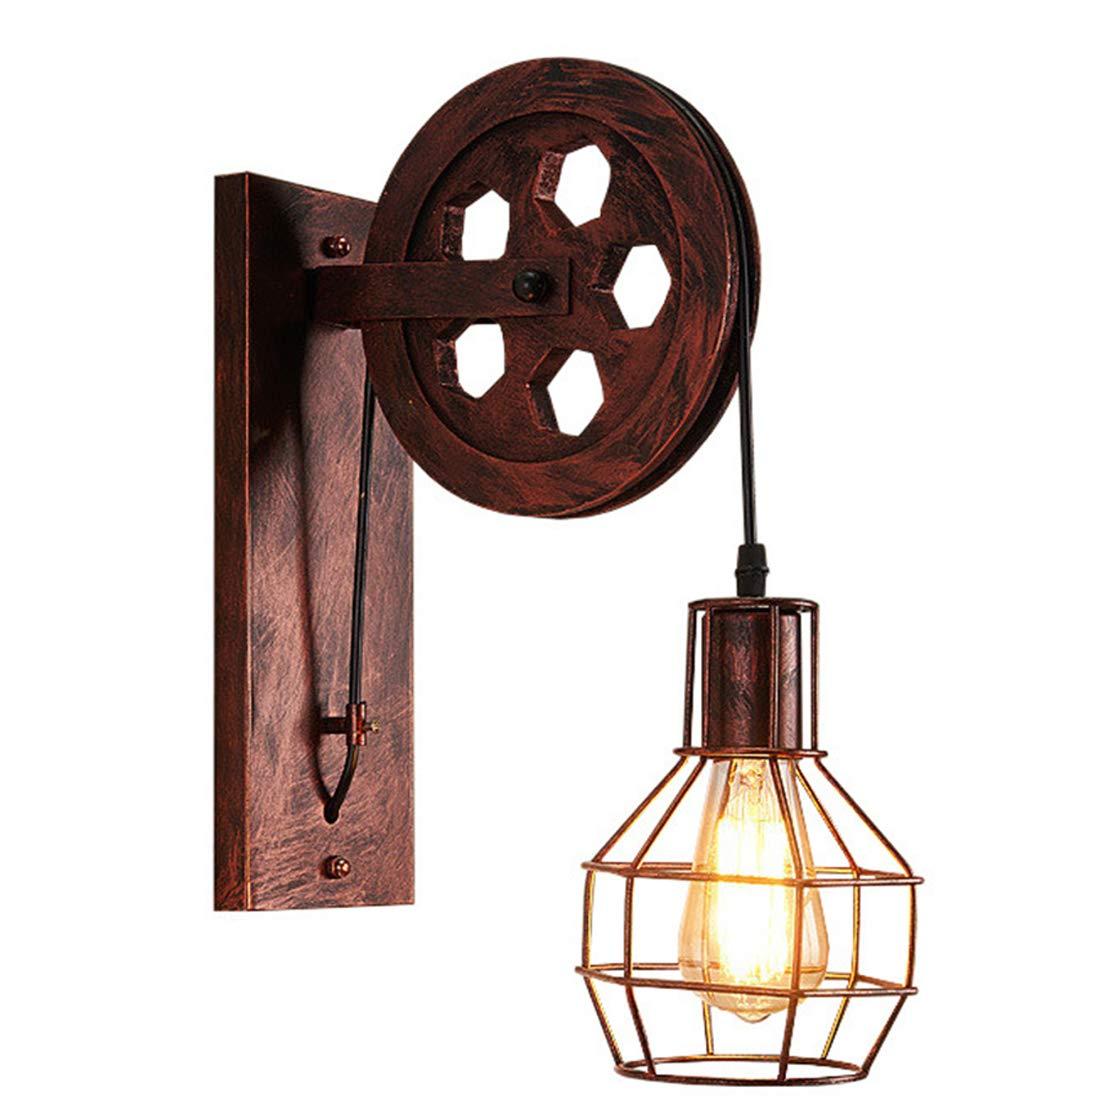 B OneGröße GRYY Retro Wandleuchte American Industrial Wind LOFT Riemenscheibe Restaurant Licht Balkon Korridor Shop Lampe Kreative,B-OneGröße